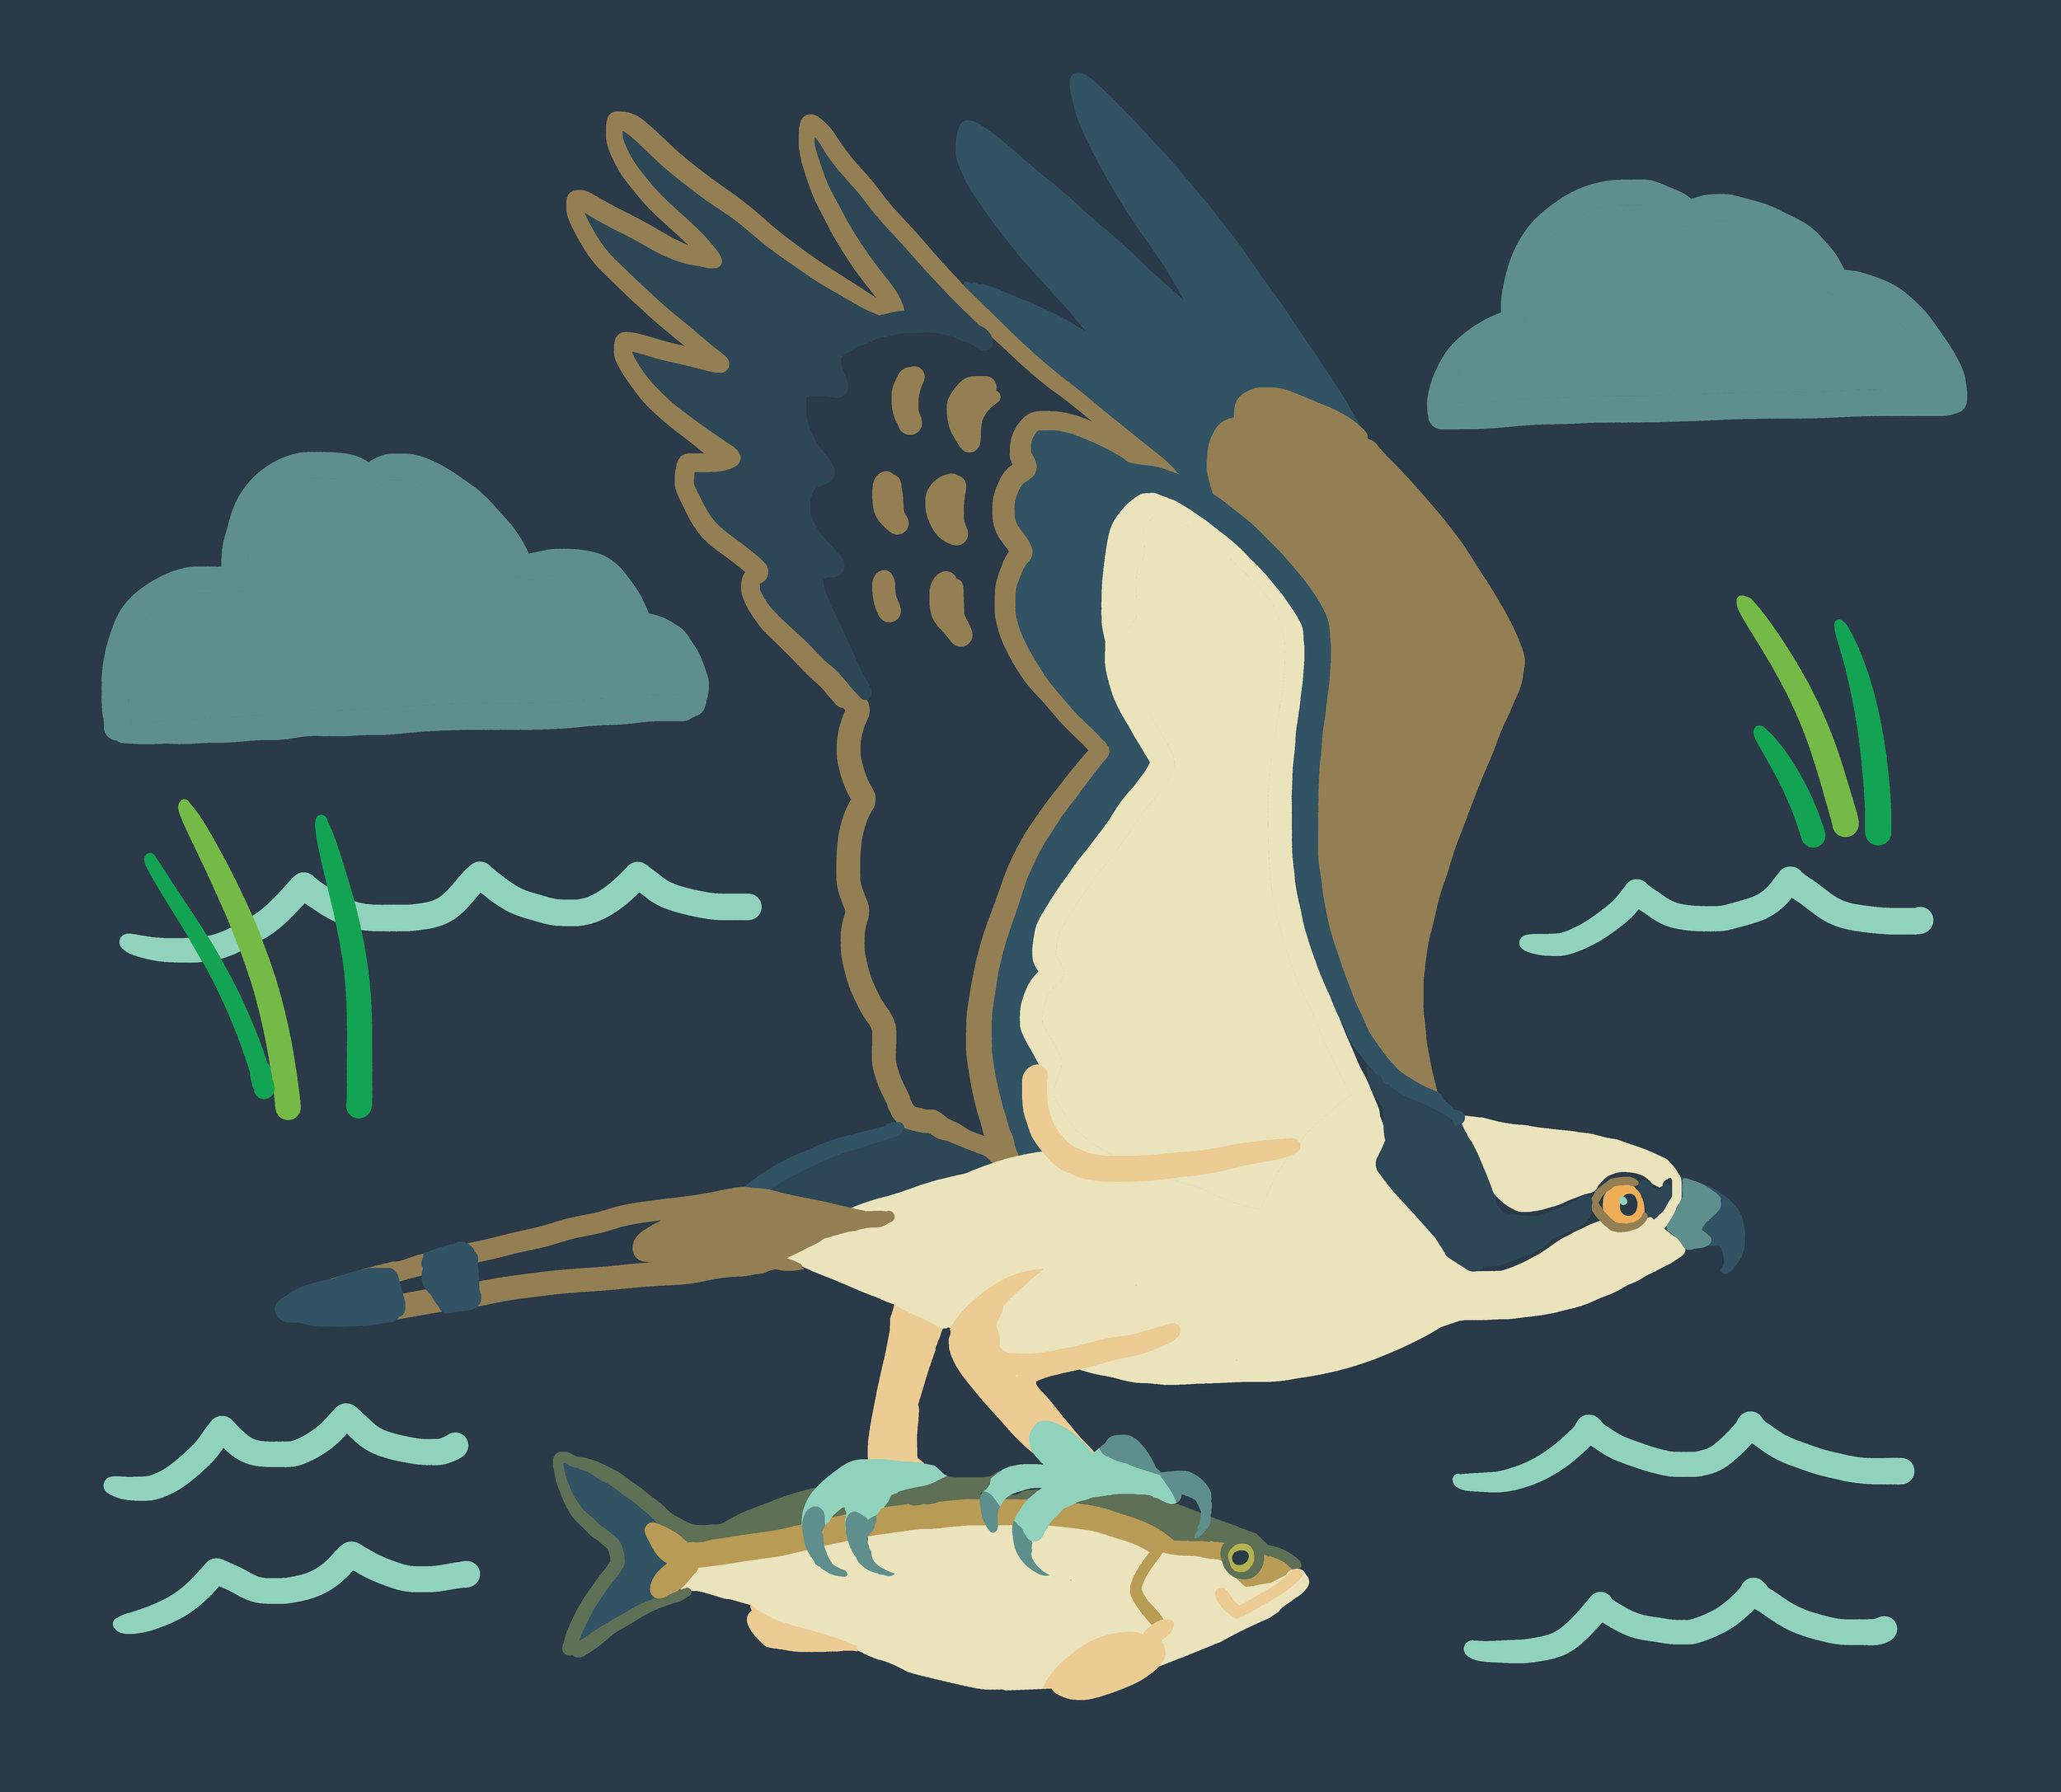 panel_osprey_fish.jpg